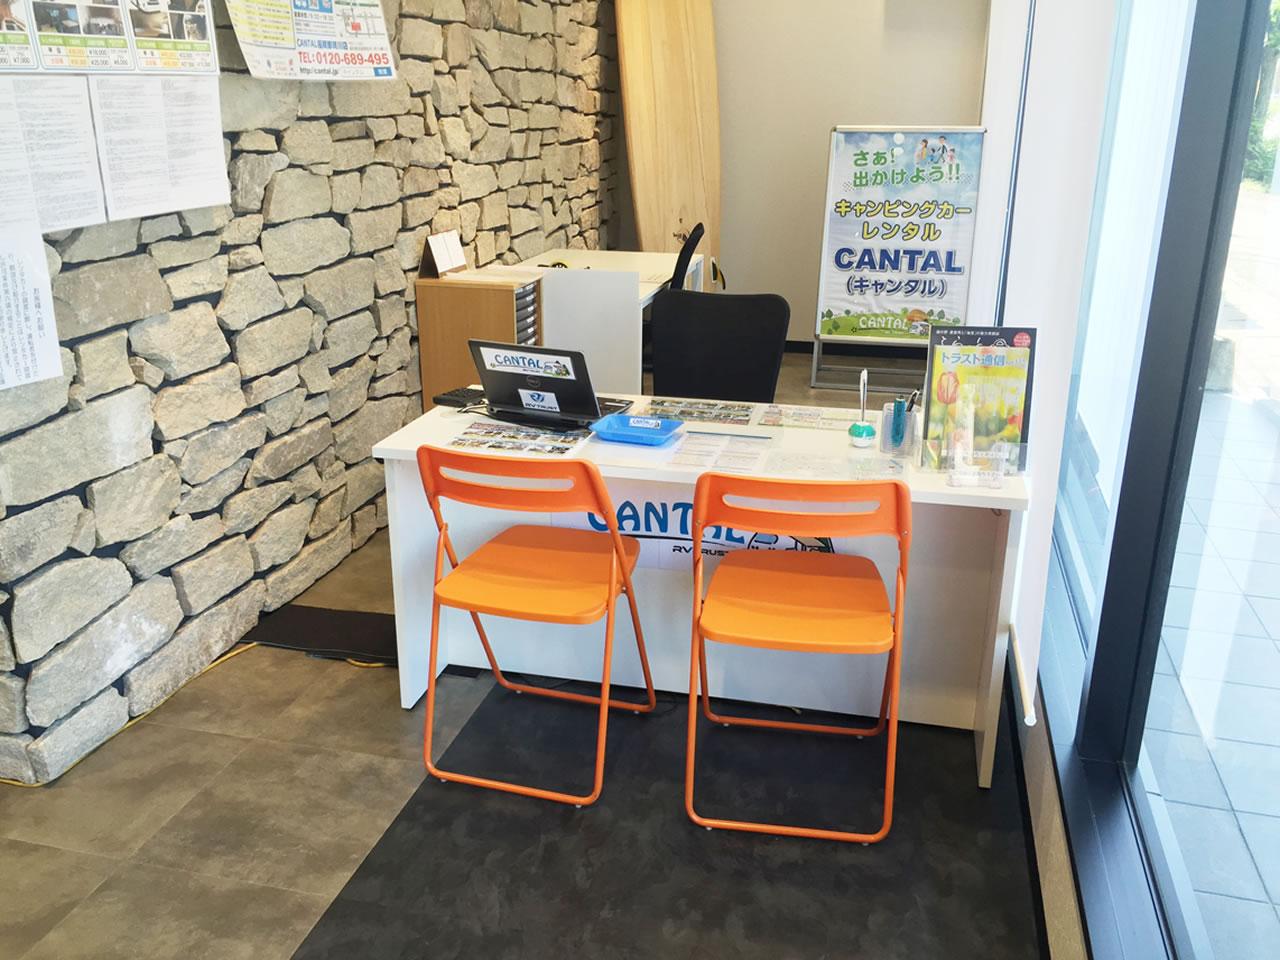 CANTAL(キャンタル) 福岡那珂川店のキャンピングカー受付場所